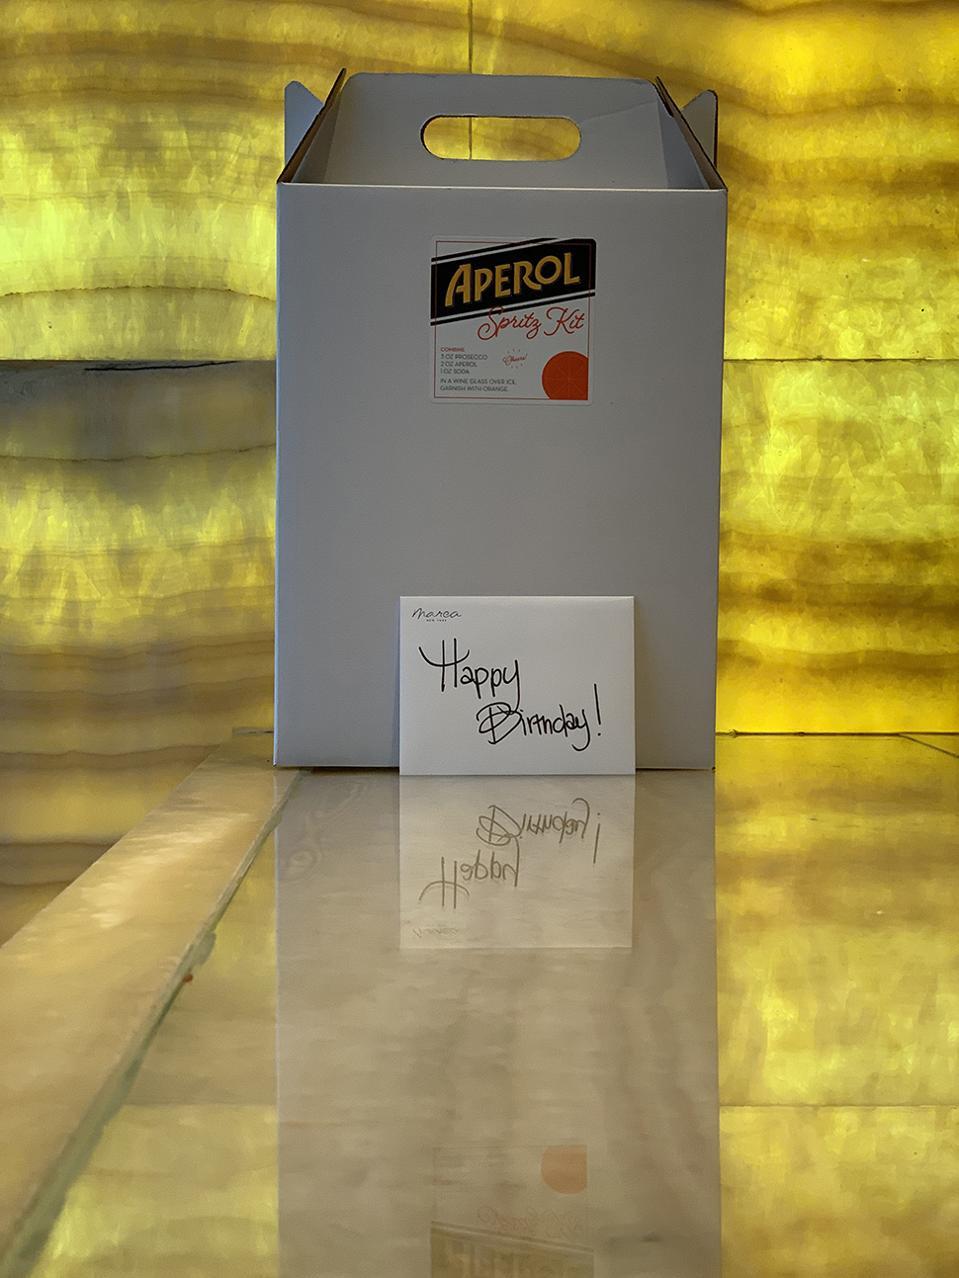 Aperol spritz kits